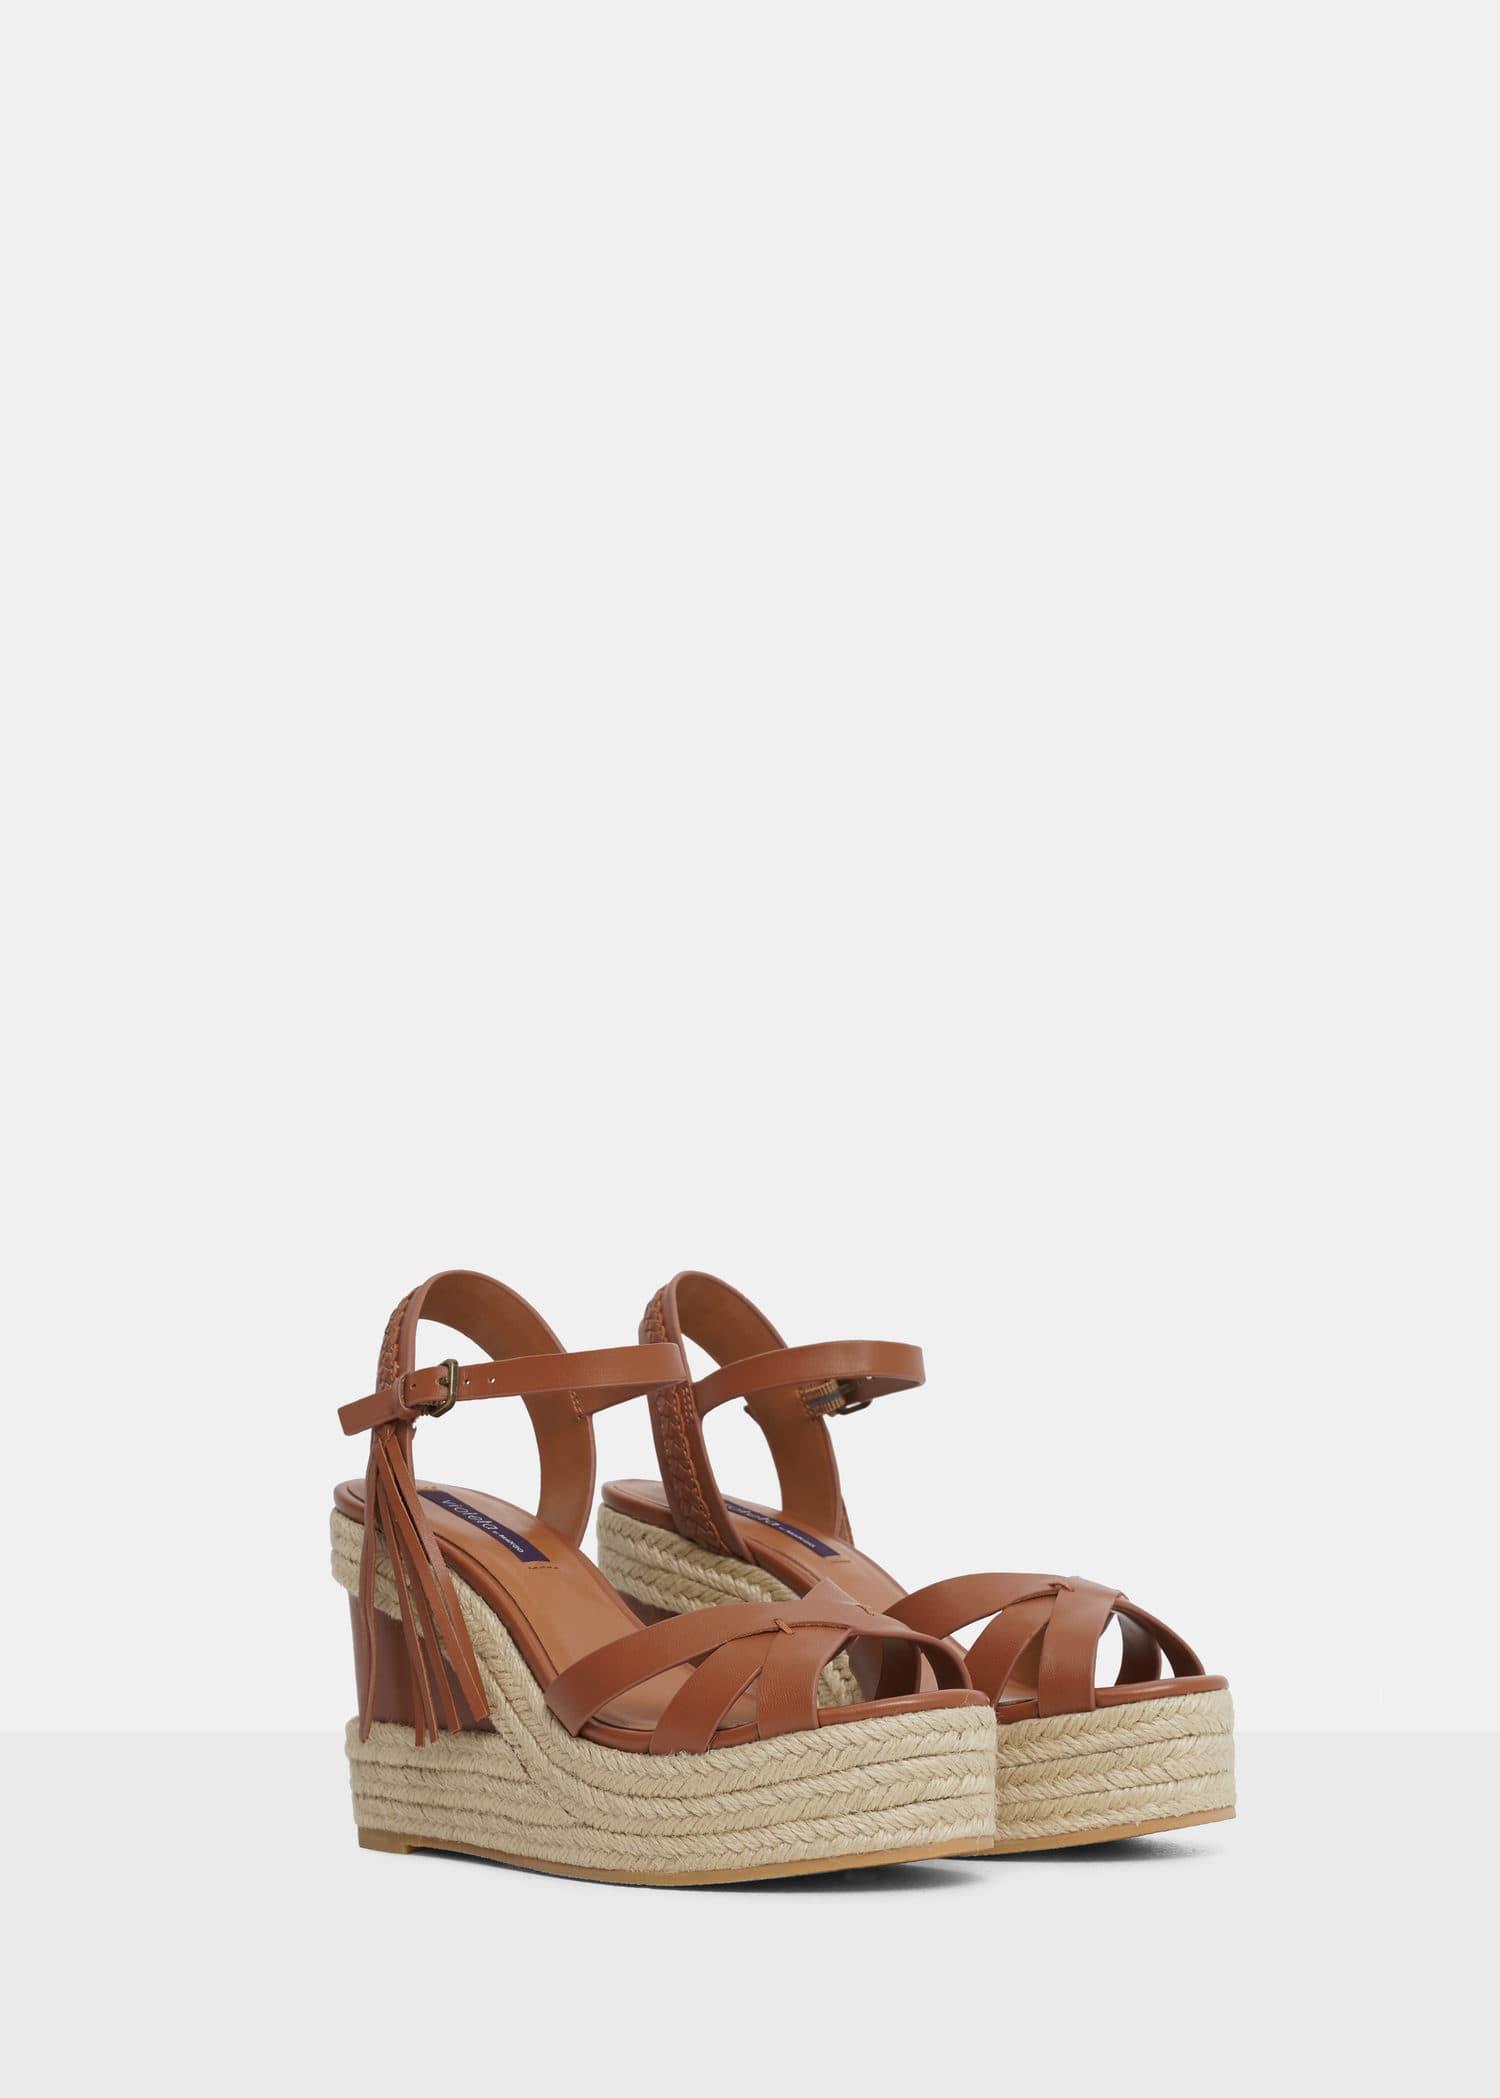 Sandales lanières plateforme Grandes tailles   OUTLET